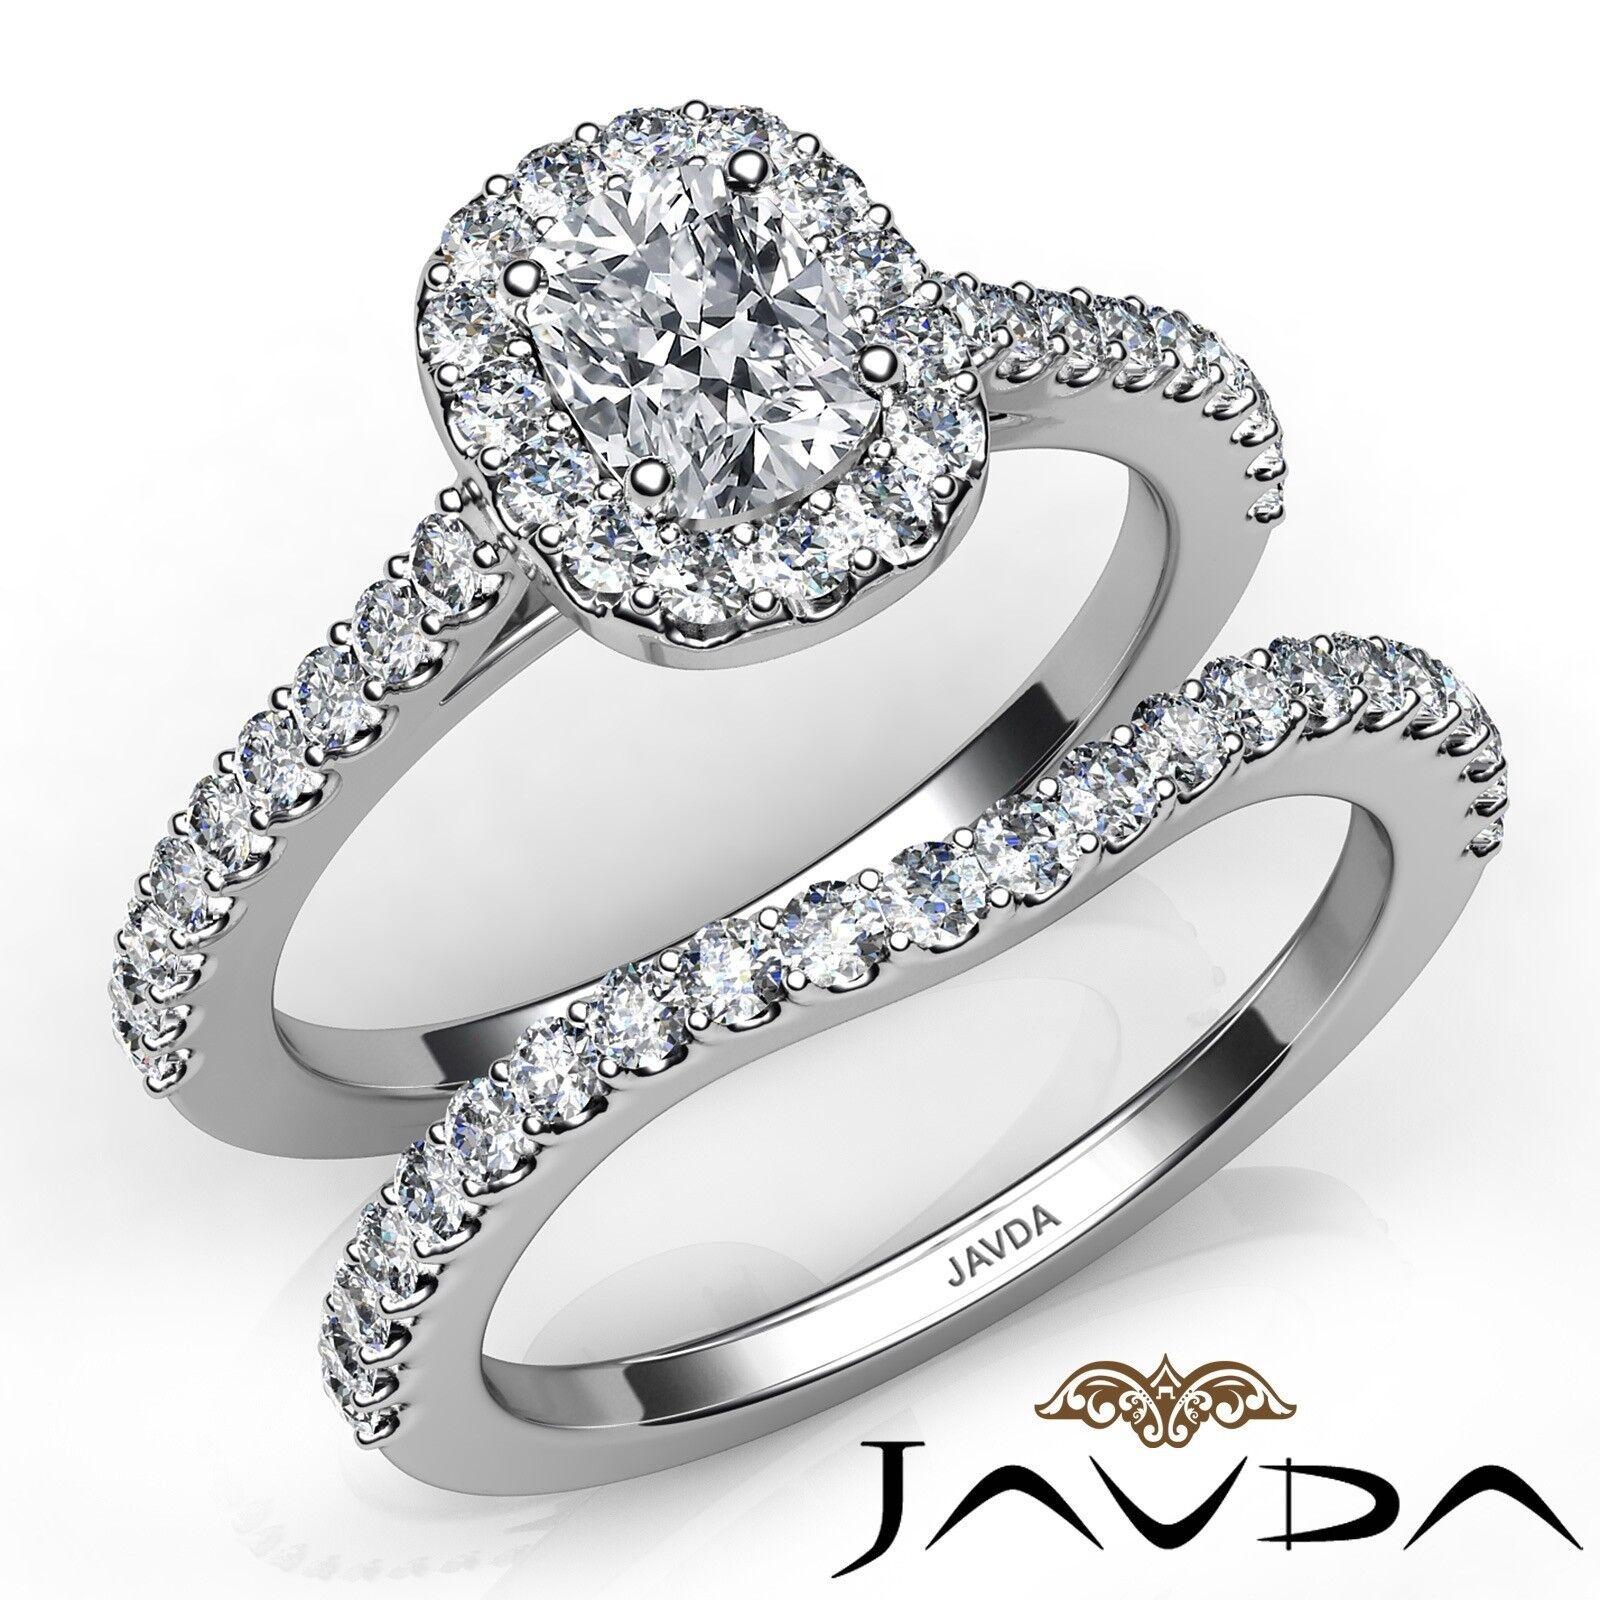 1.5ct Halo Pave Side Stone Bridal Cushion Diamond Engagement Ring GIA E-VS2 Gold